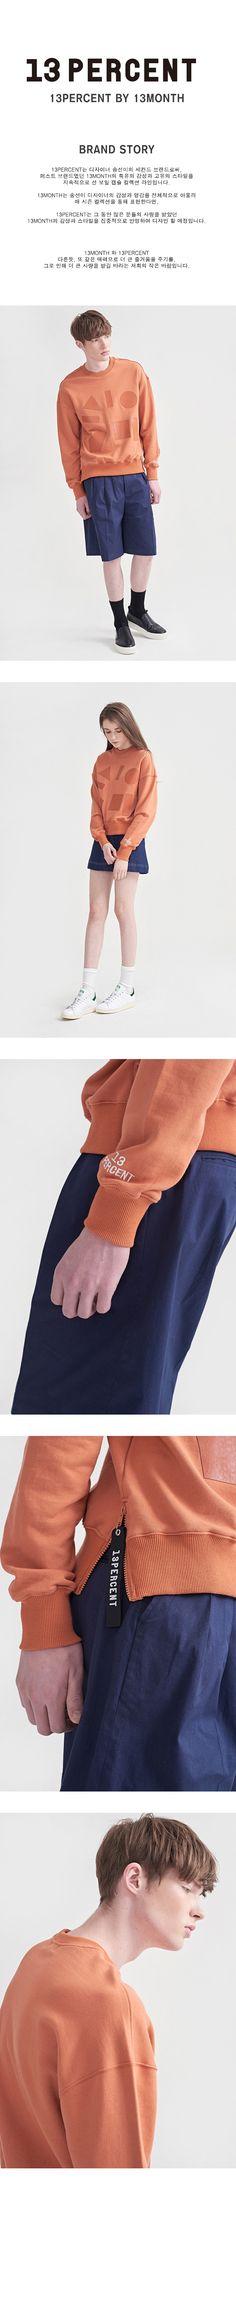 WIZWID:위즈위드 - [13month:써티먼스]Puzzle Sweatshirt Orange